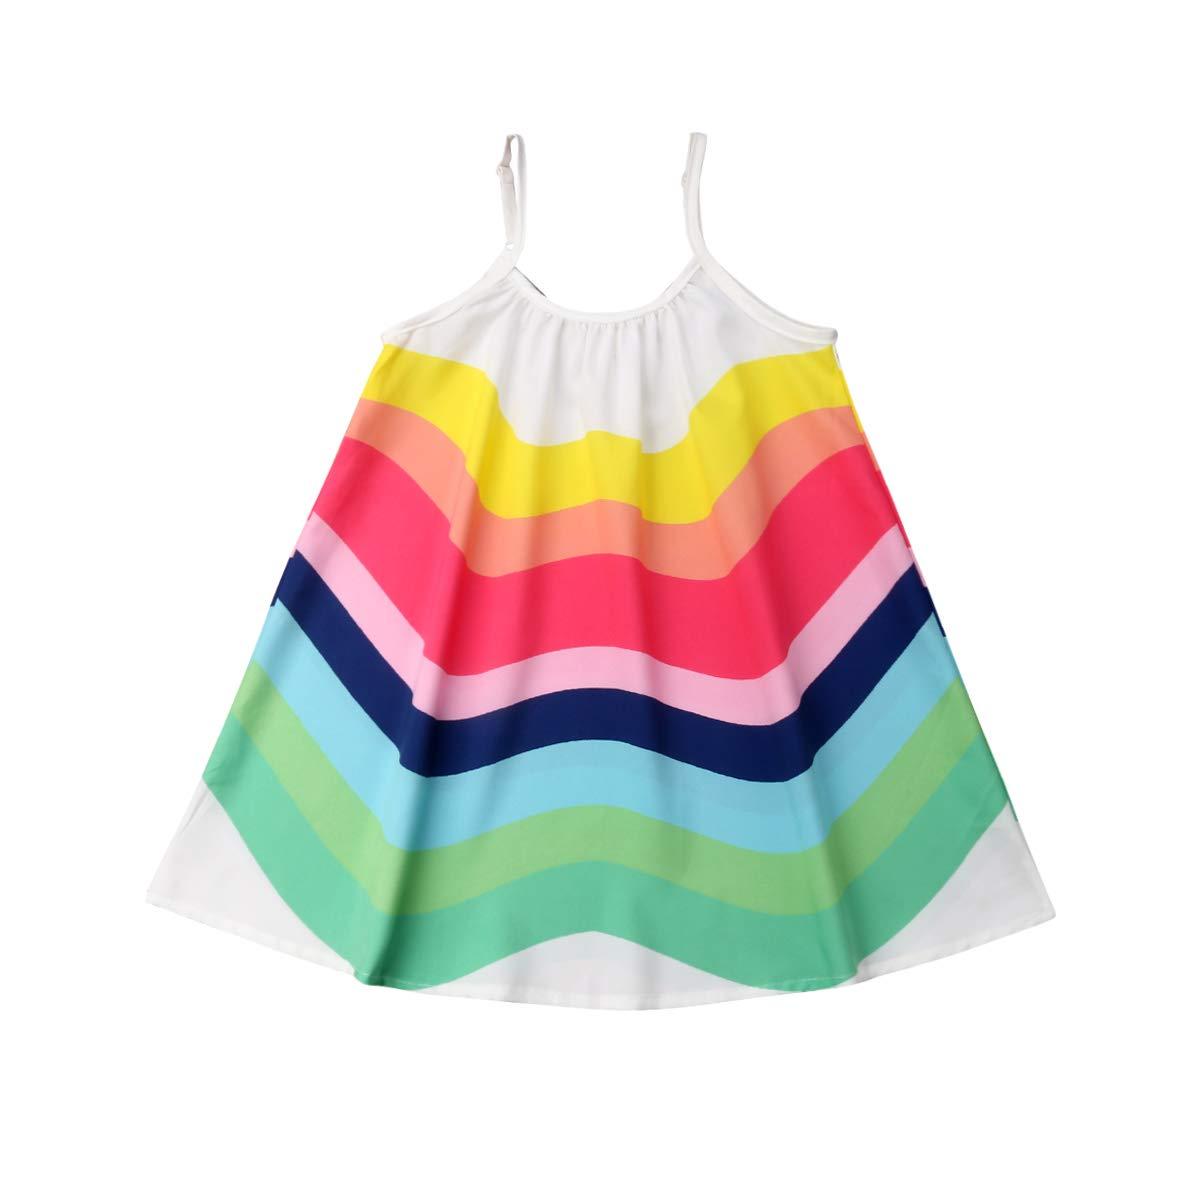 Toddler Baby Kid Girls Sleeveless Rainbow Dress Strap A-line Swing Princess Dress Sundress Summer Outfit 1-6Y